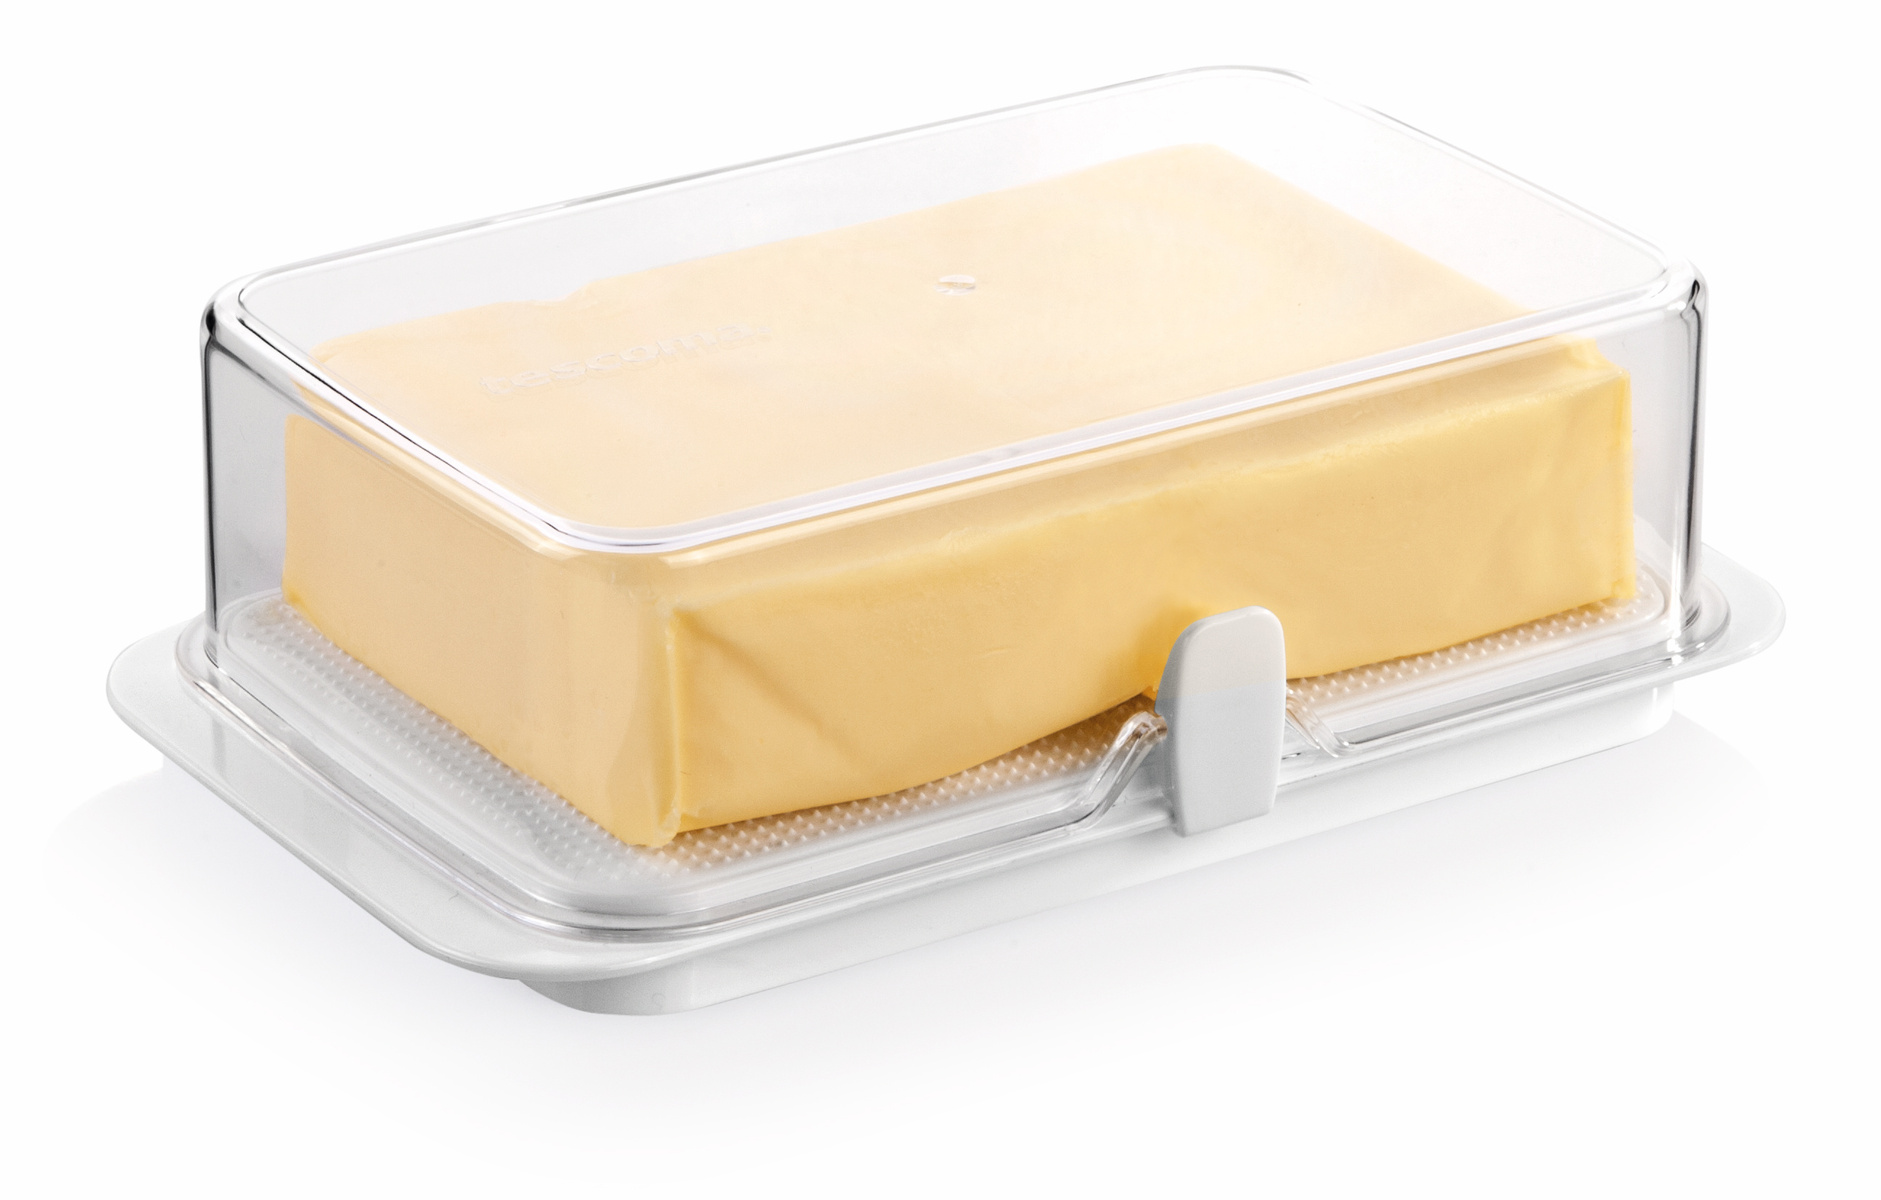 Tescoma Purity Zdravá dóza do chladničky máslenka ,